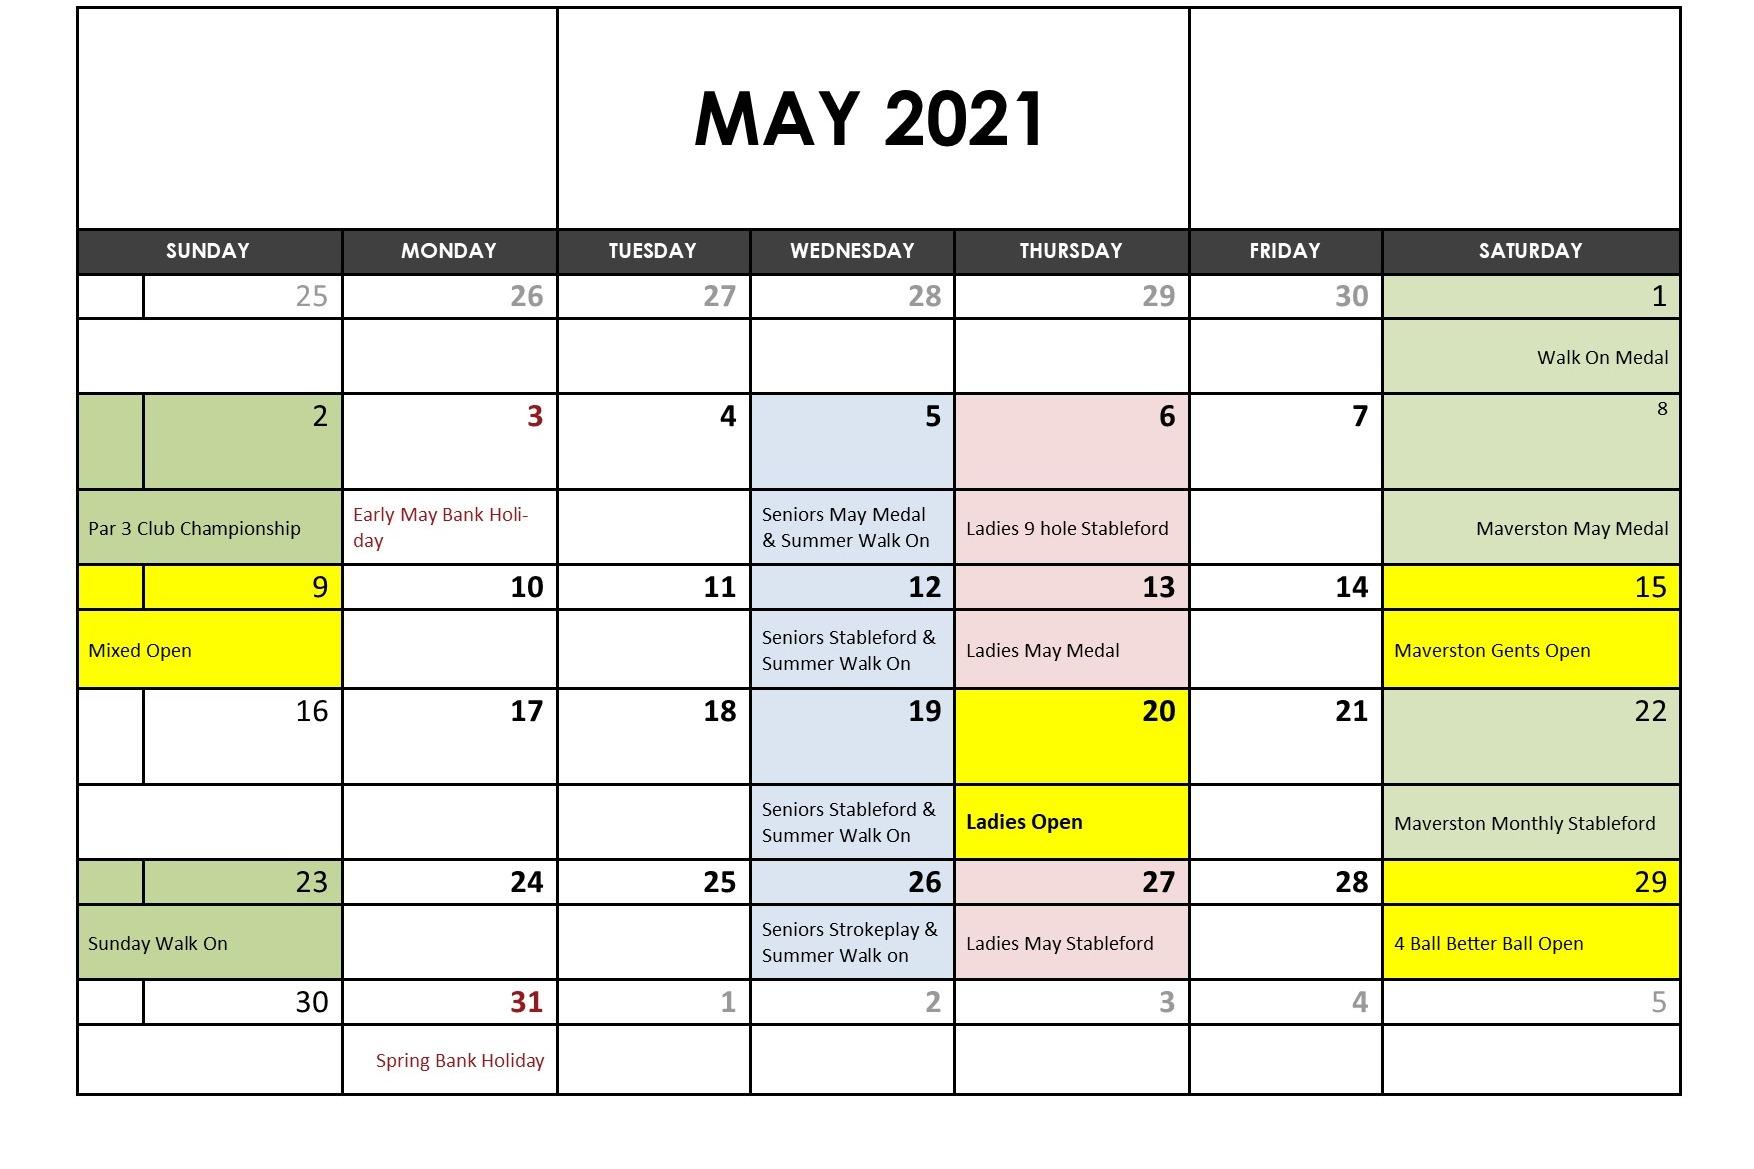 May 2021 Fixtures